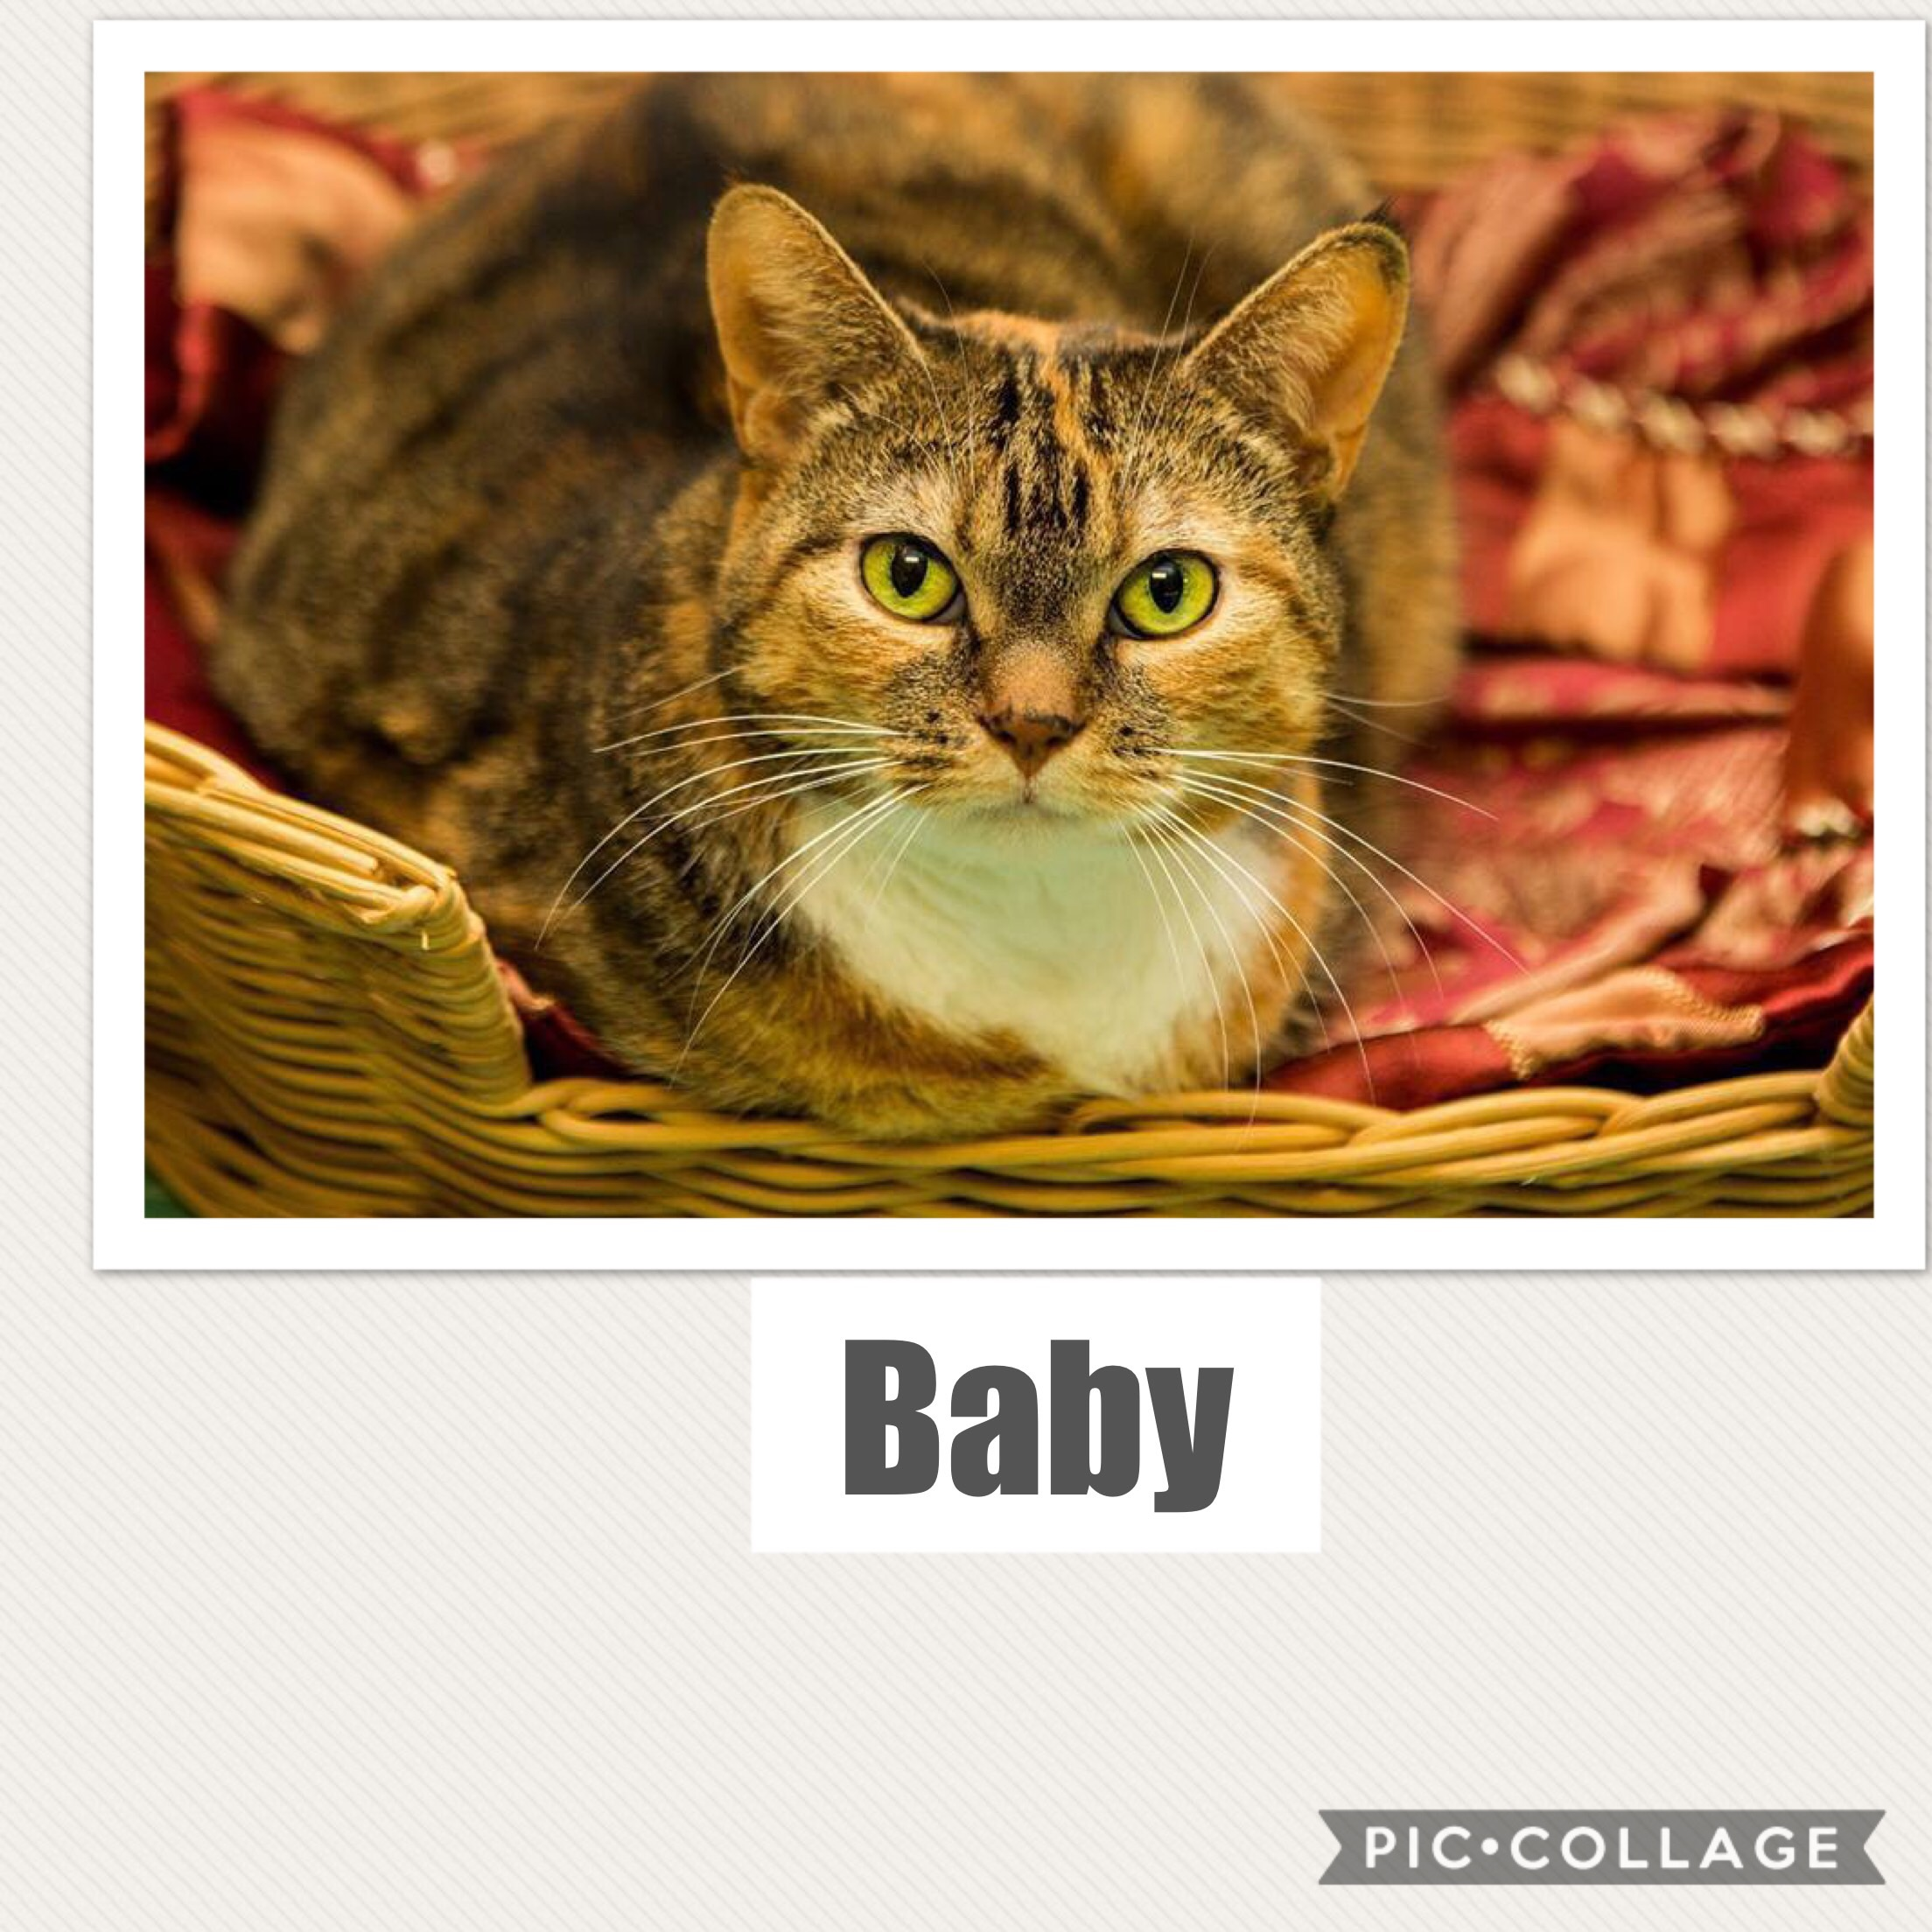 Baby - Calico